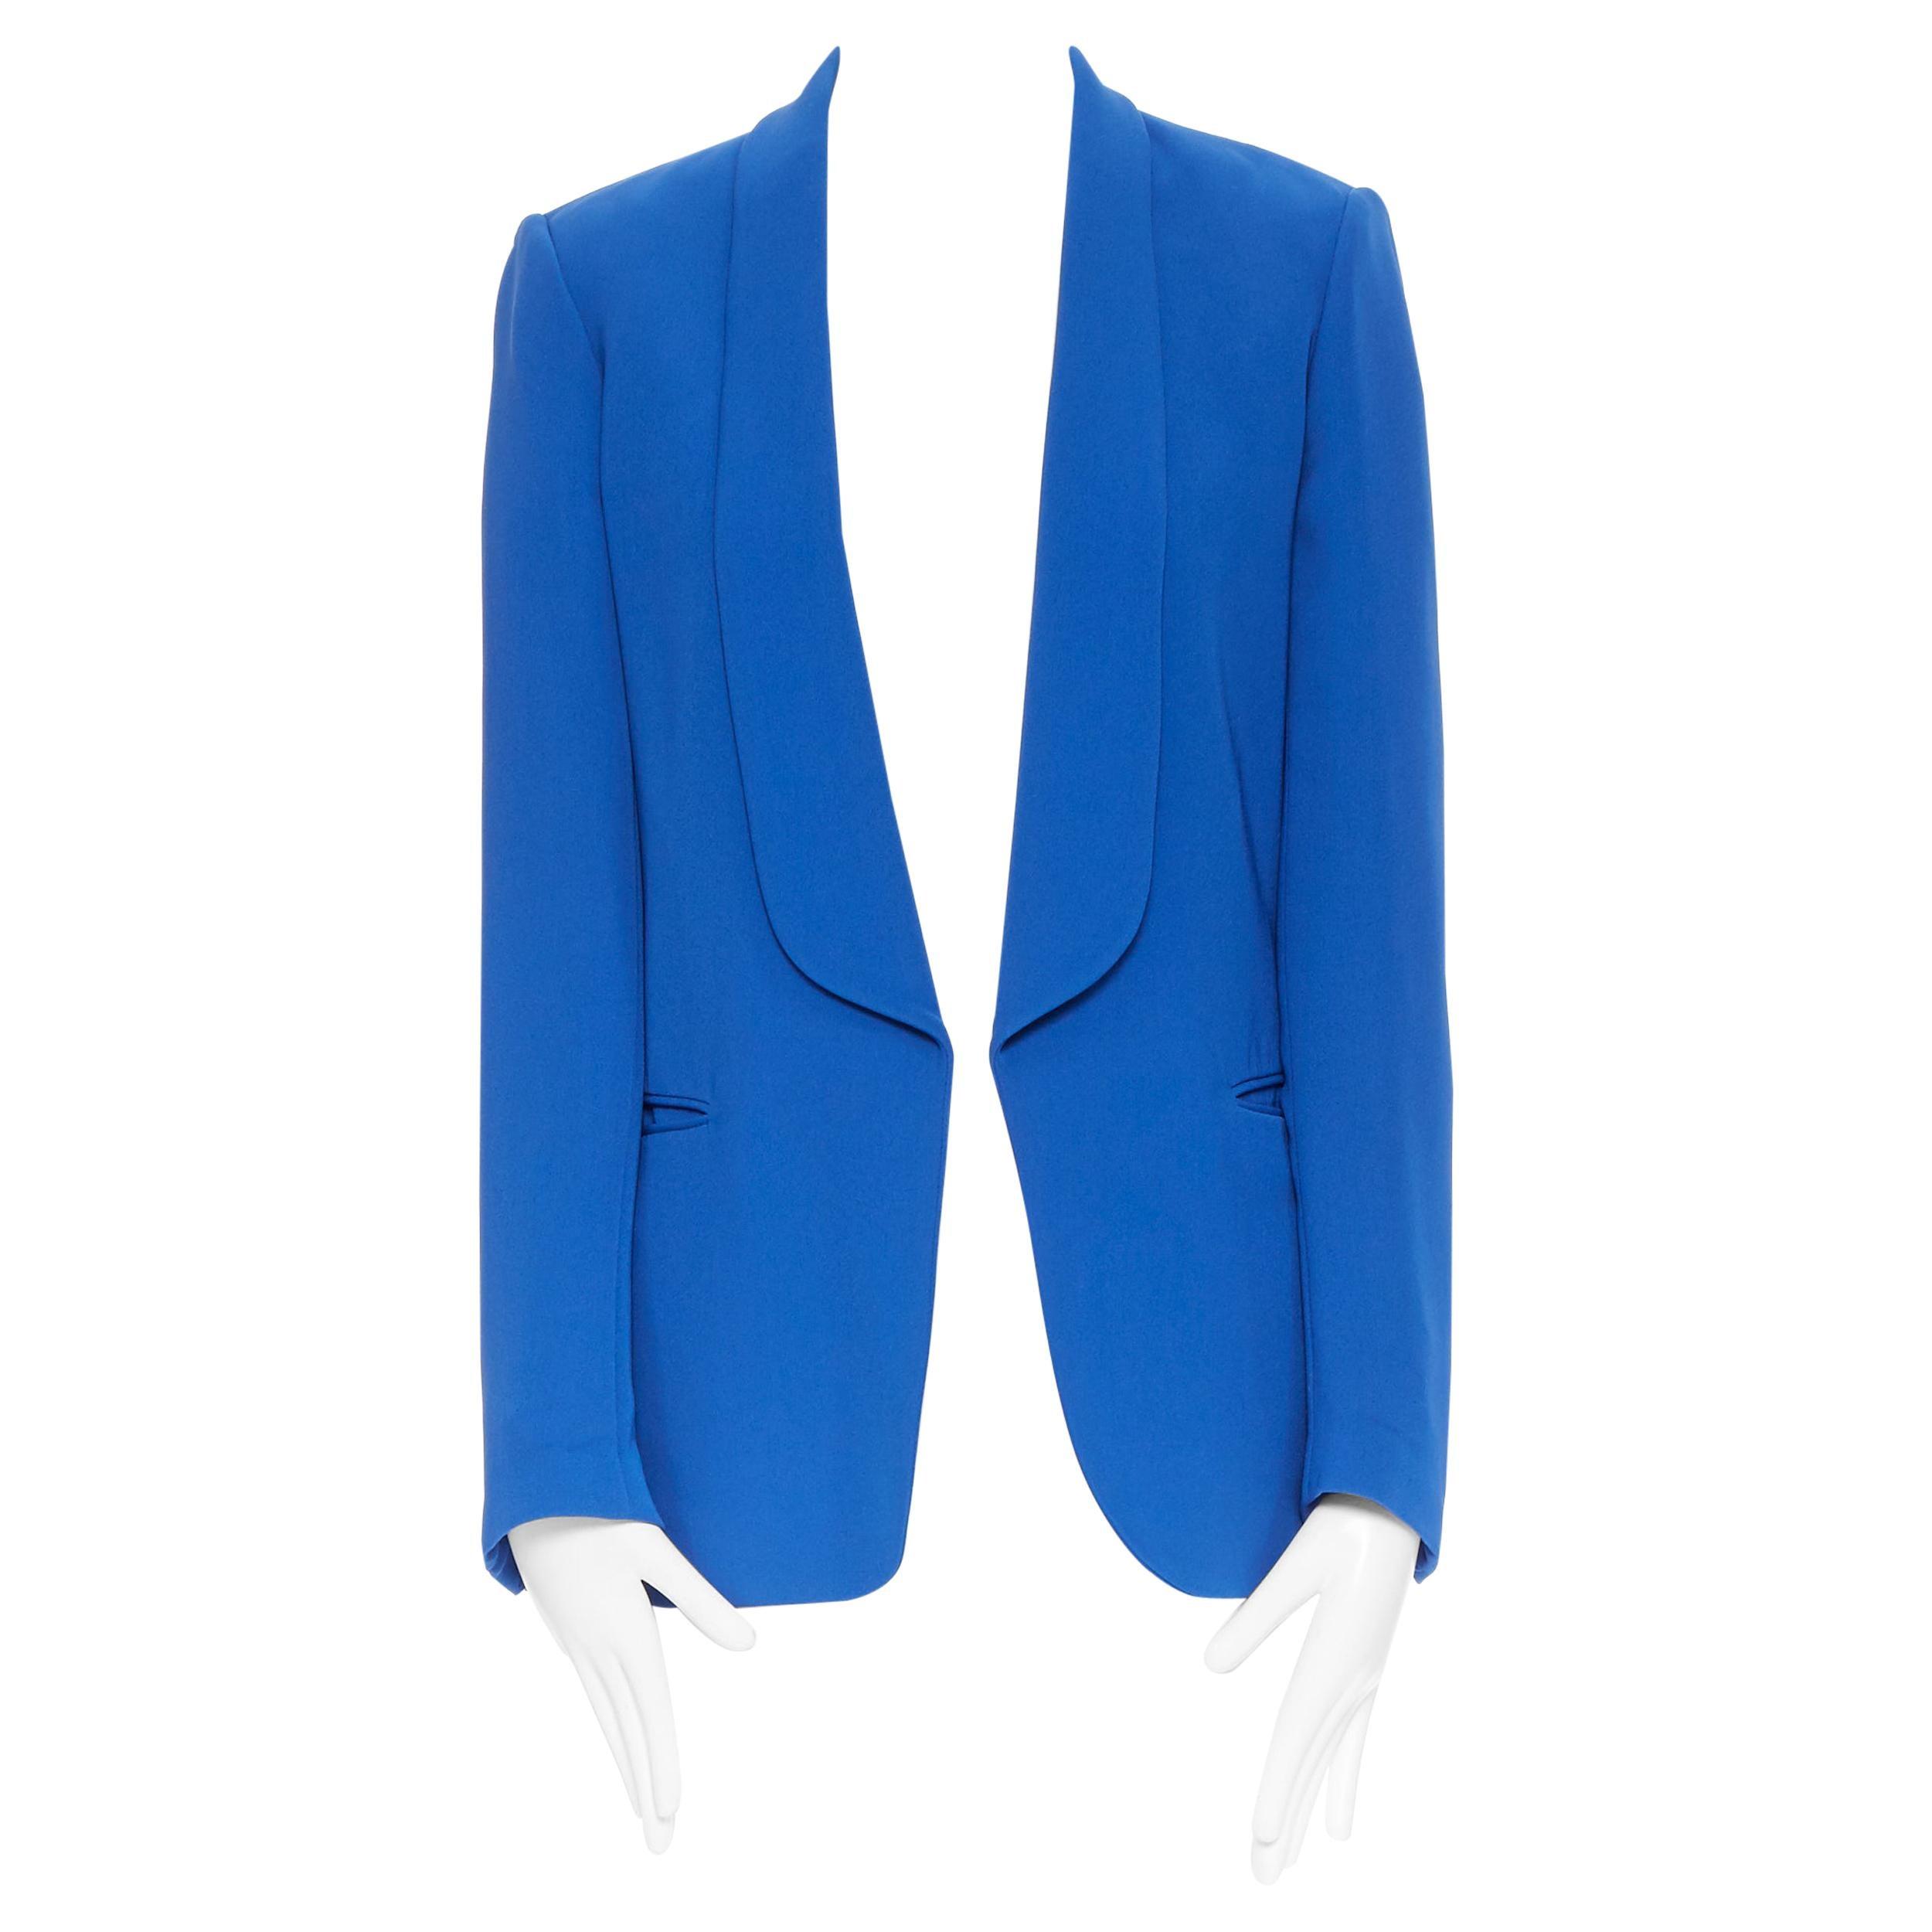 CELINE PHOEBE PHILO 100% silk cobalt blut shawl collar blazer jacket FR36 S